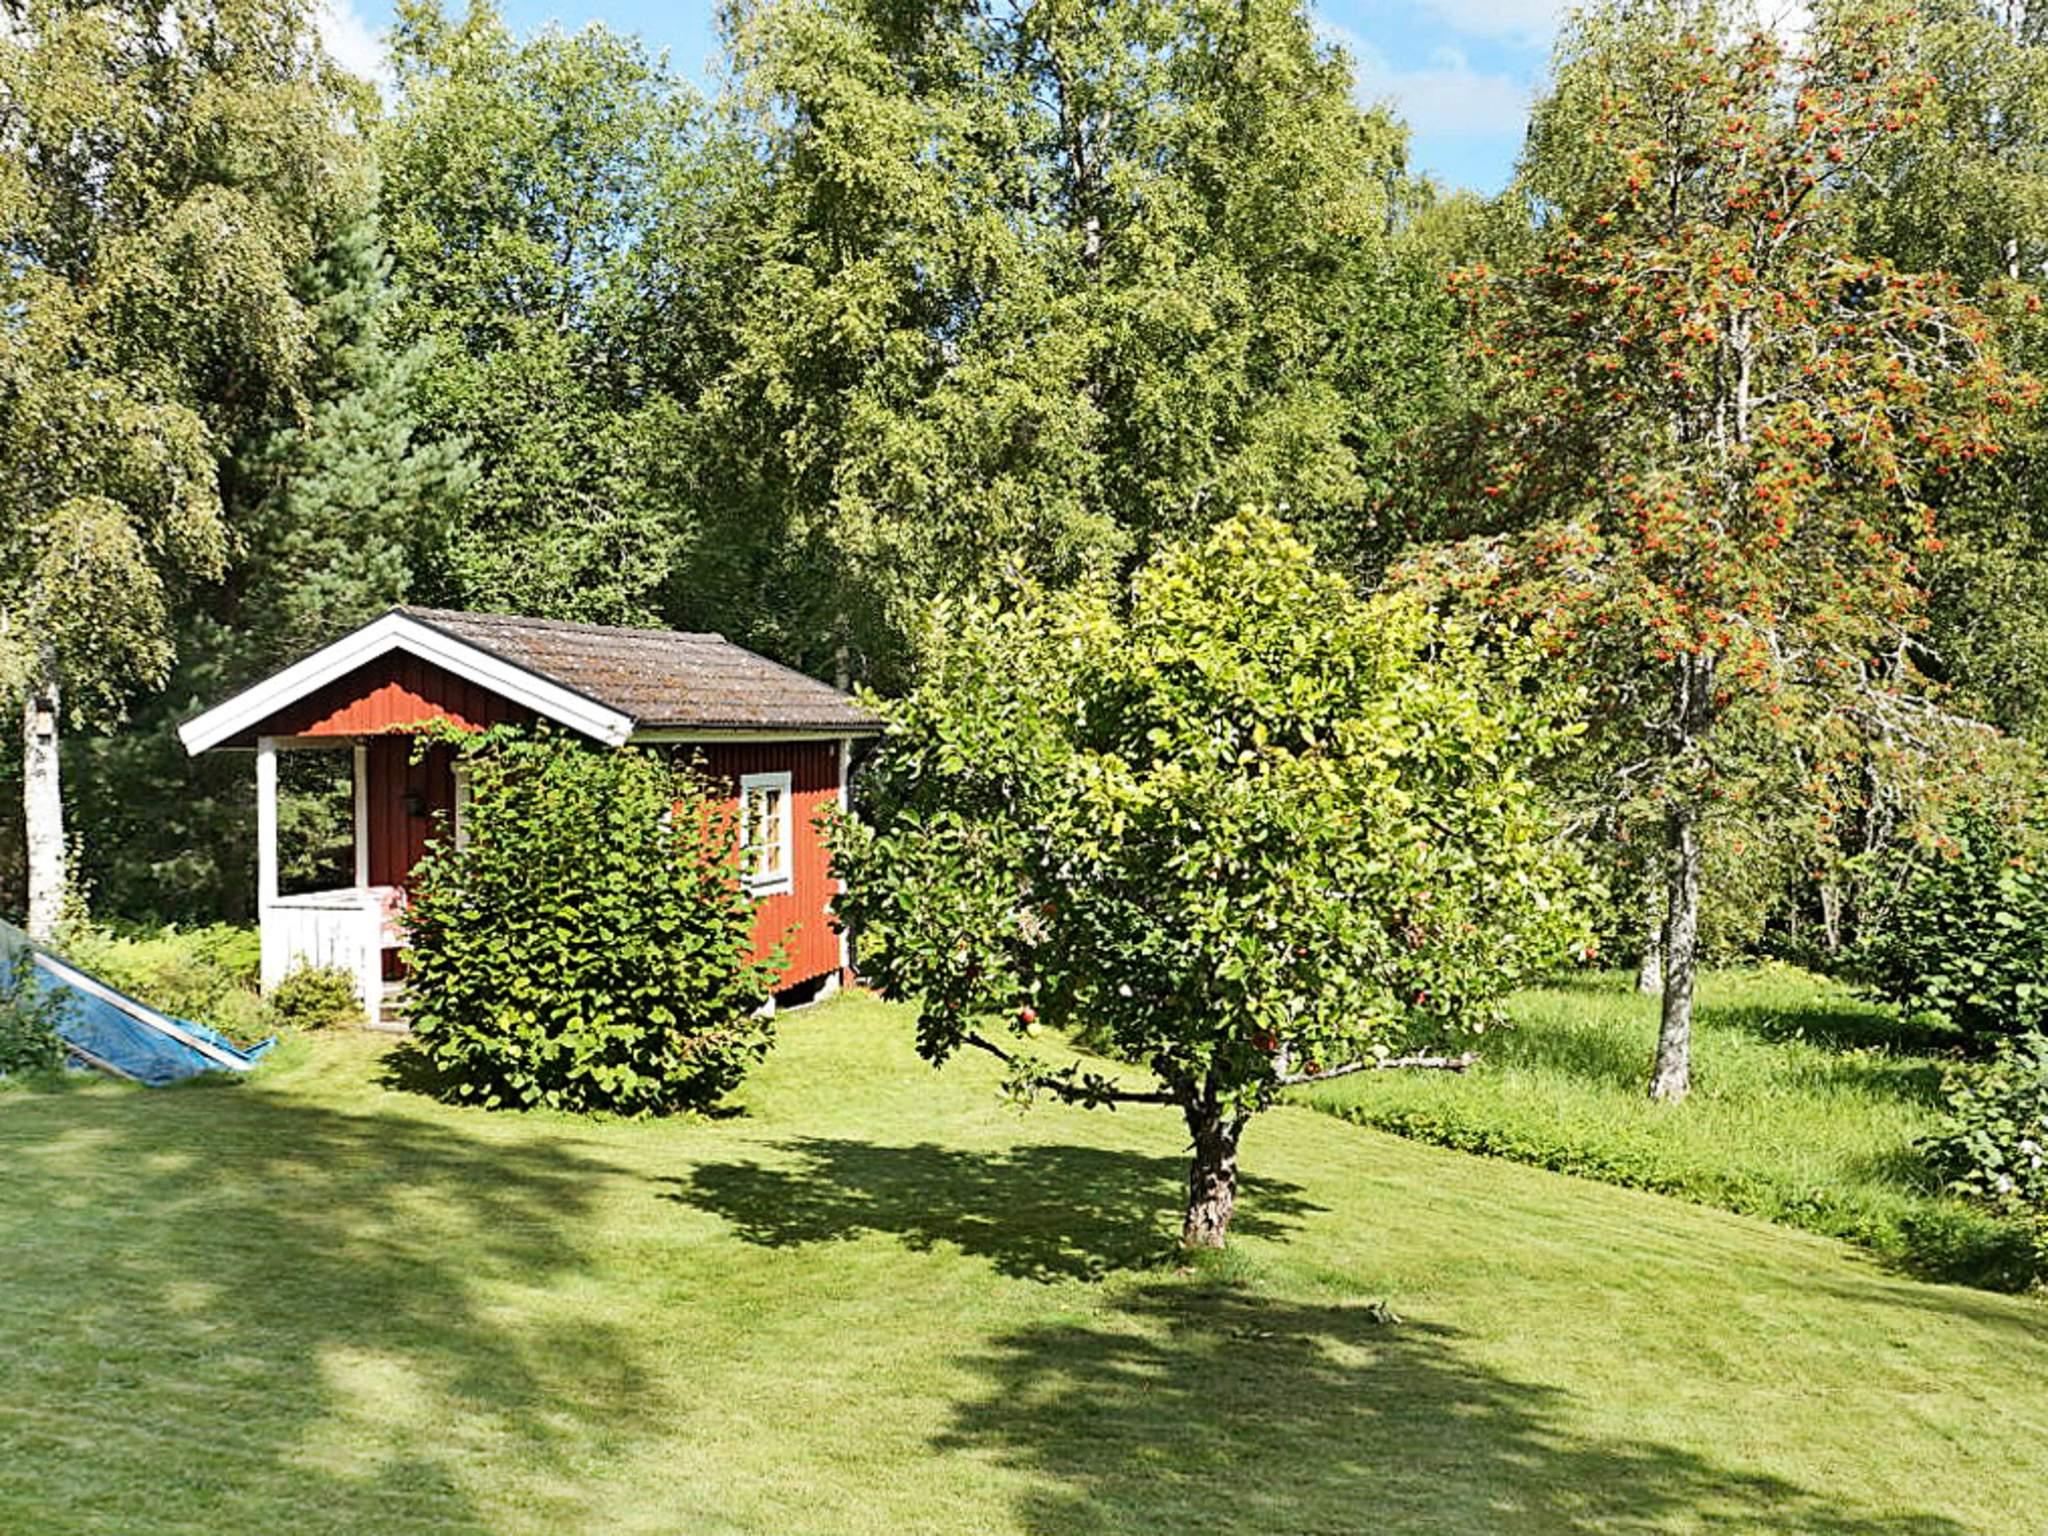 Ferienhaus Motala (921156), Motala, Östergötlands län, Südschweden, Schweden, Bild 10